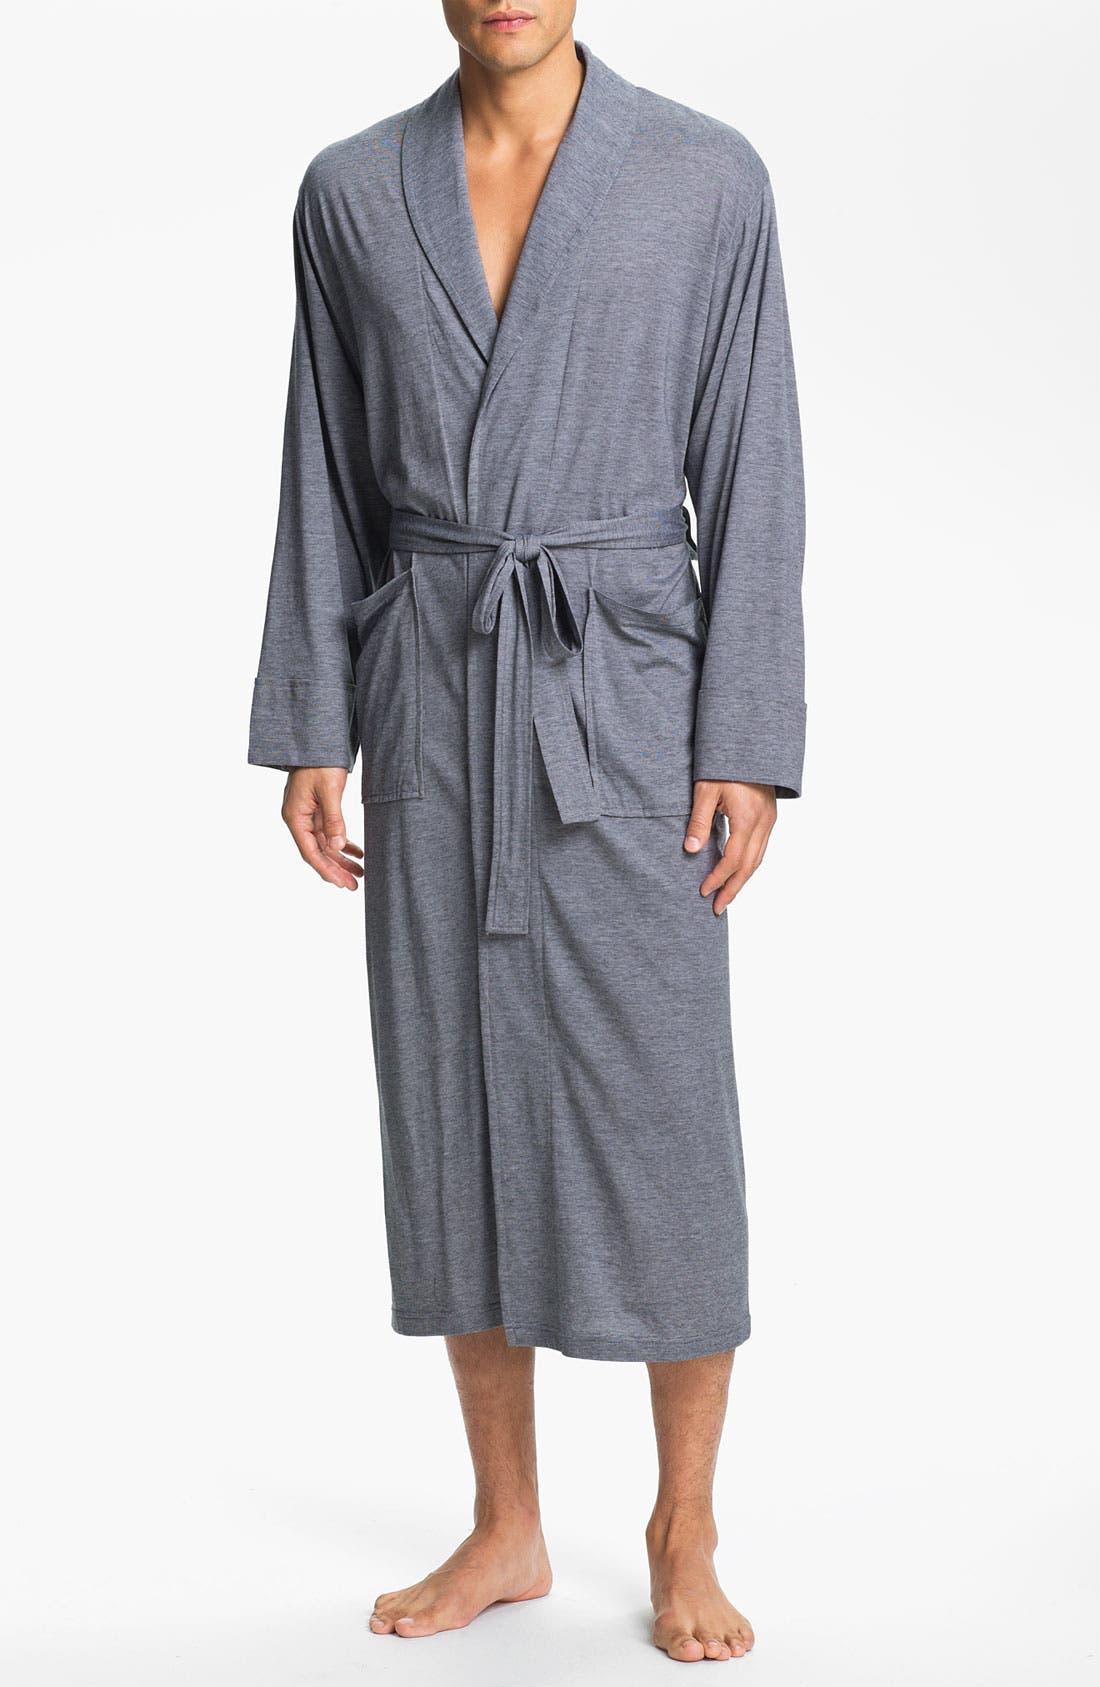 Alternate Image 1 Selected - Daniel Buchler Pima Cotton & Modal Robe